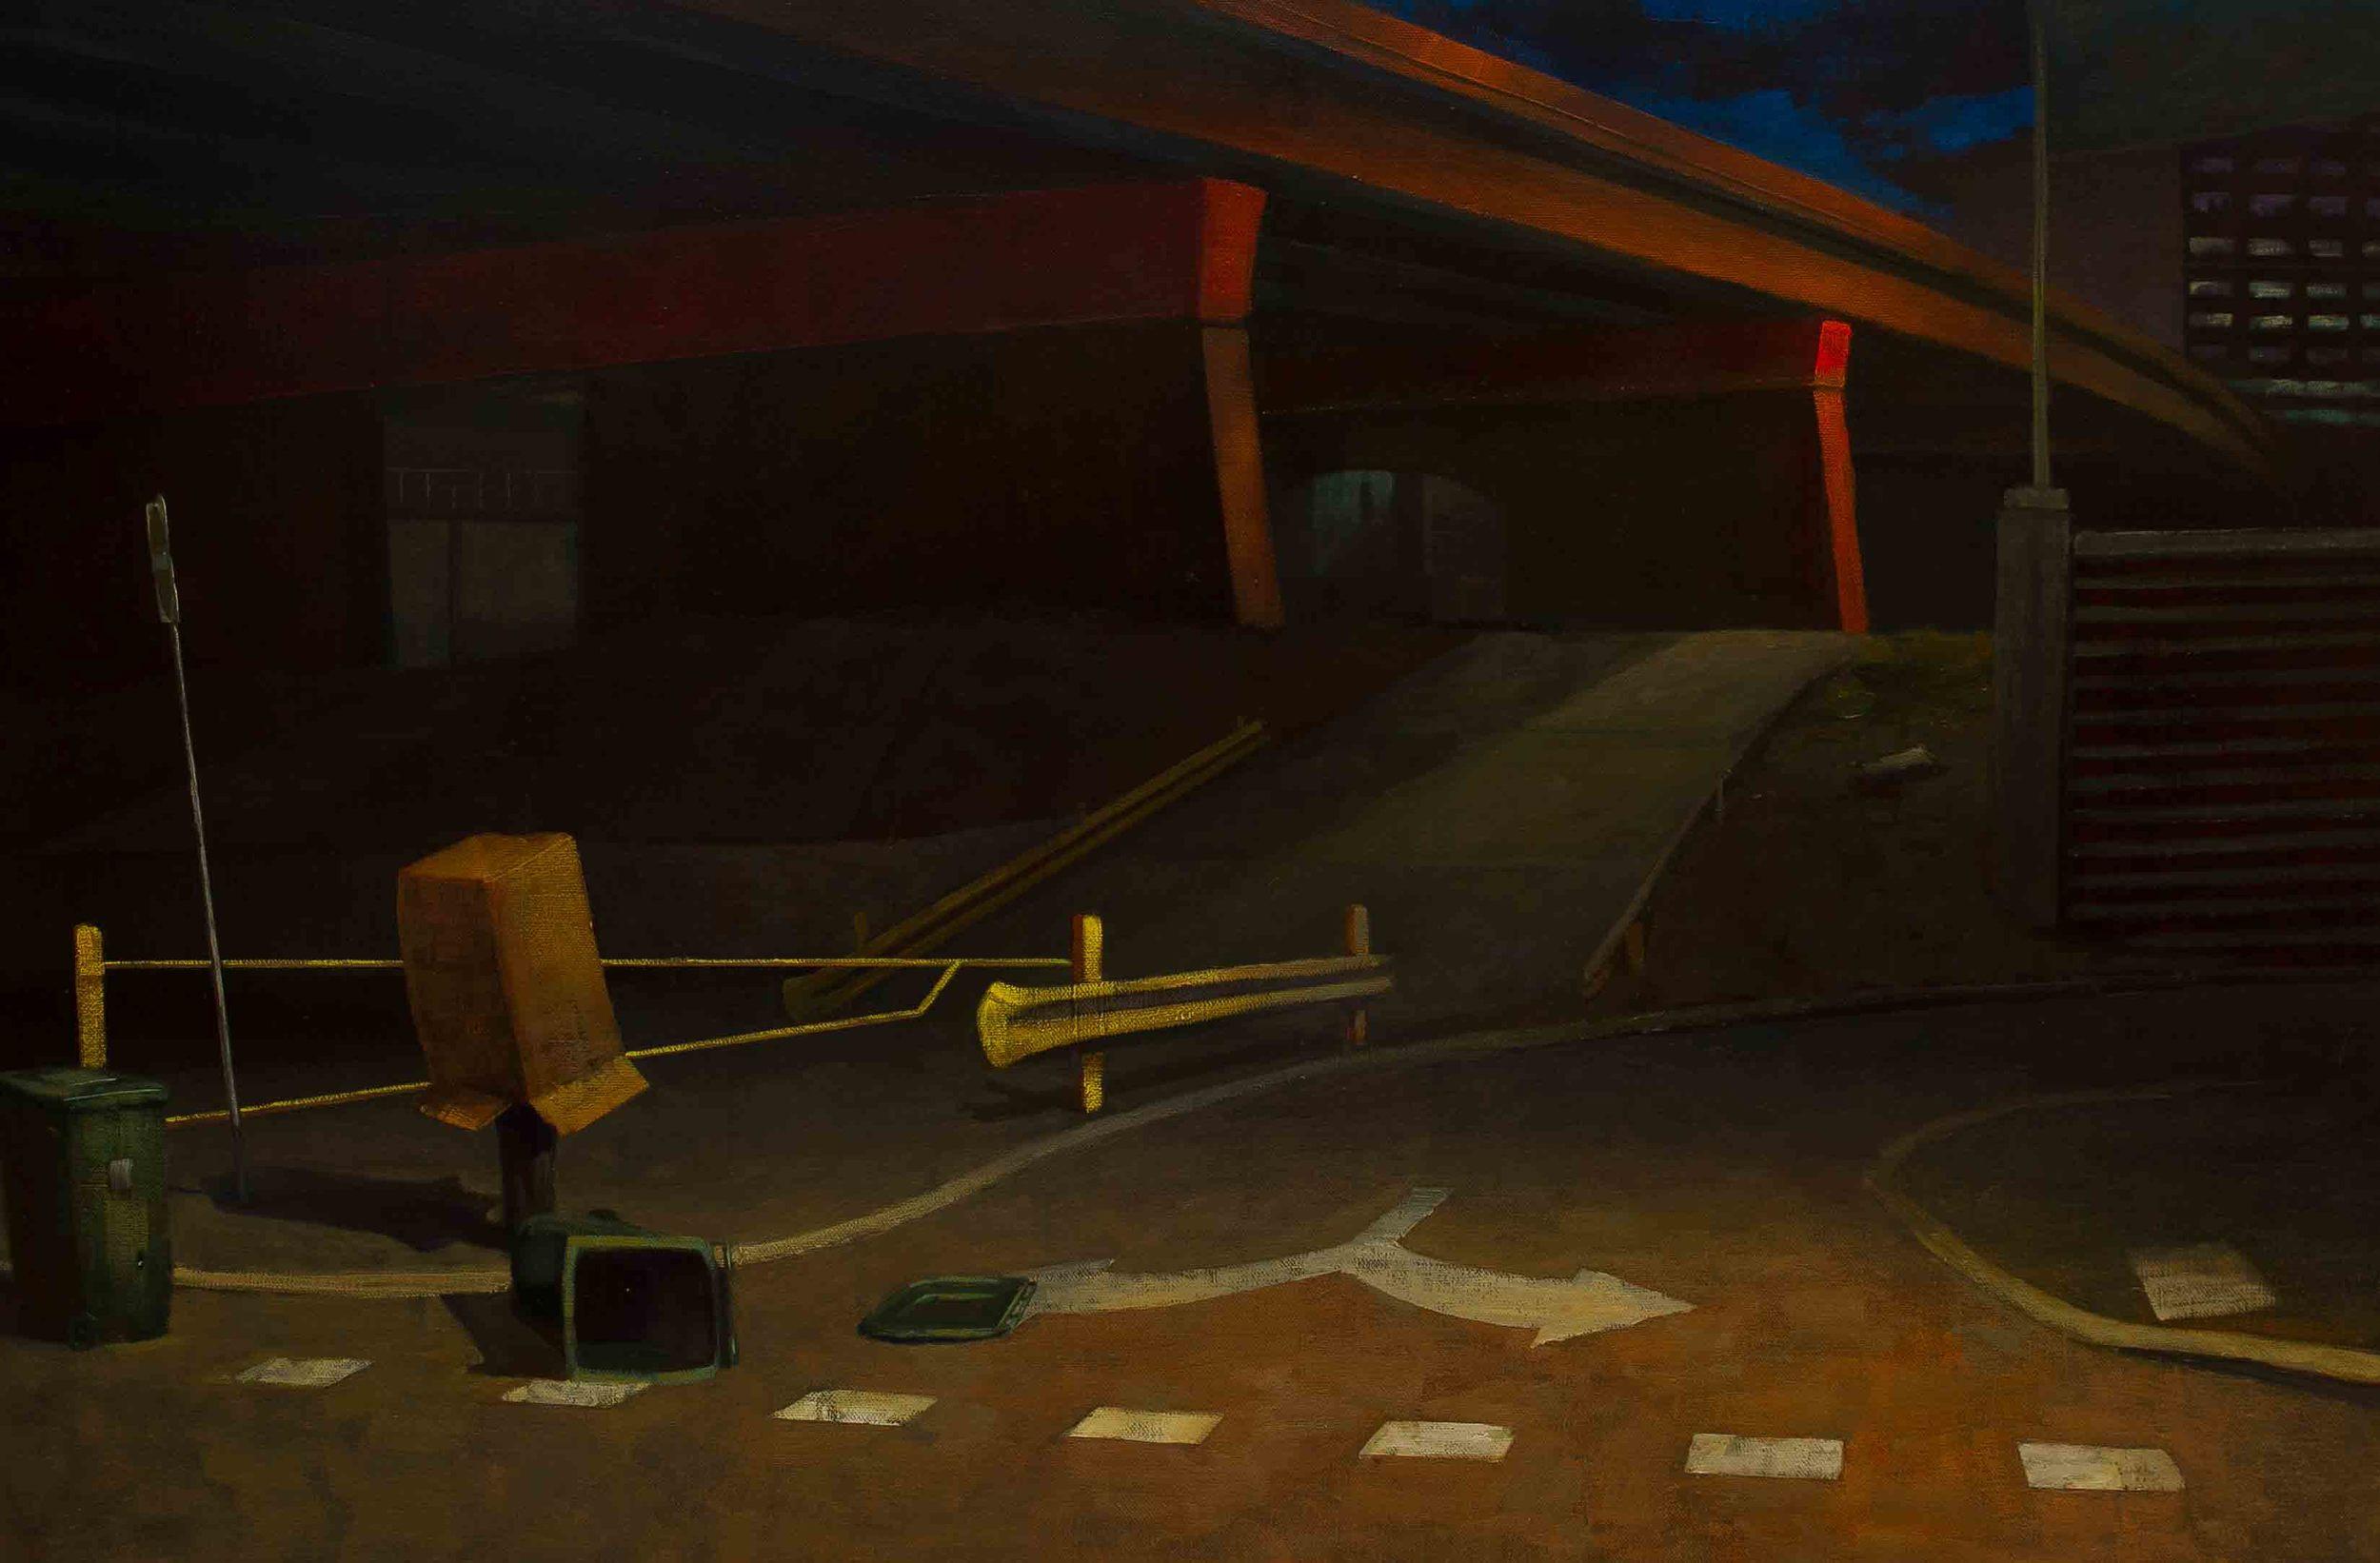 MANIFOLDharley-First-Hyland-Tea-Oil-on-Belgian-Linen-86.5x130cm-2015 LR.jpg